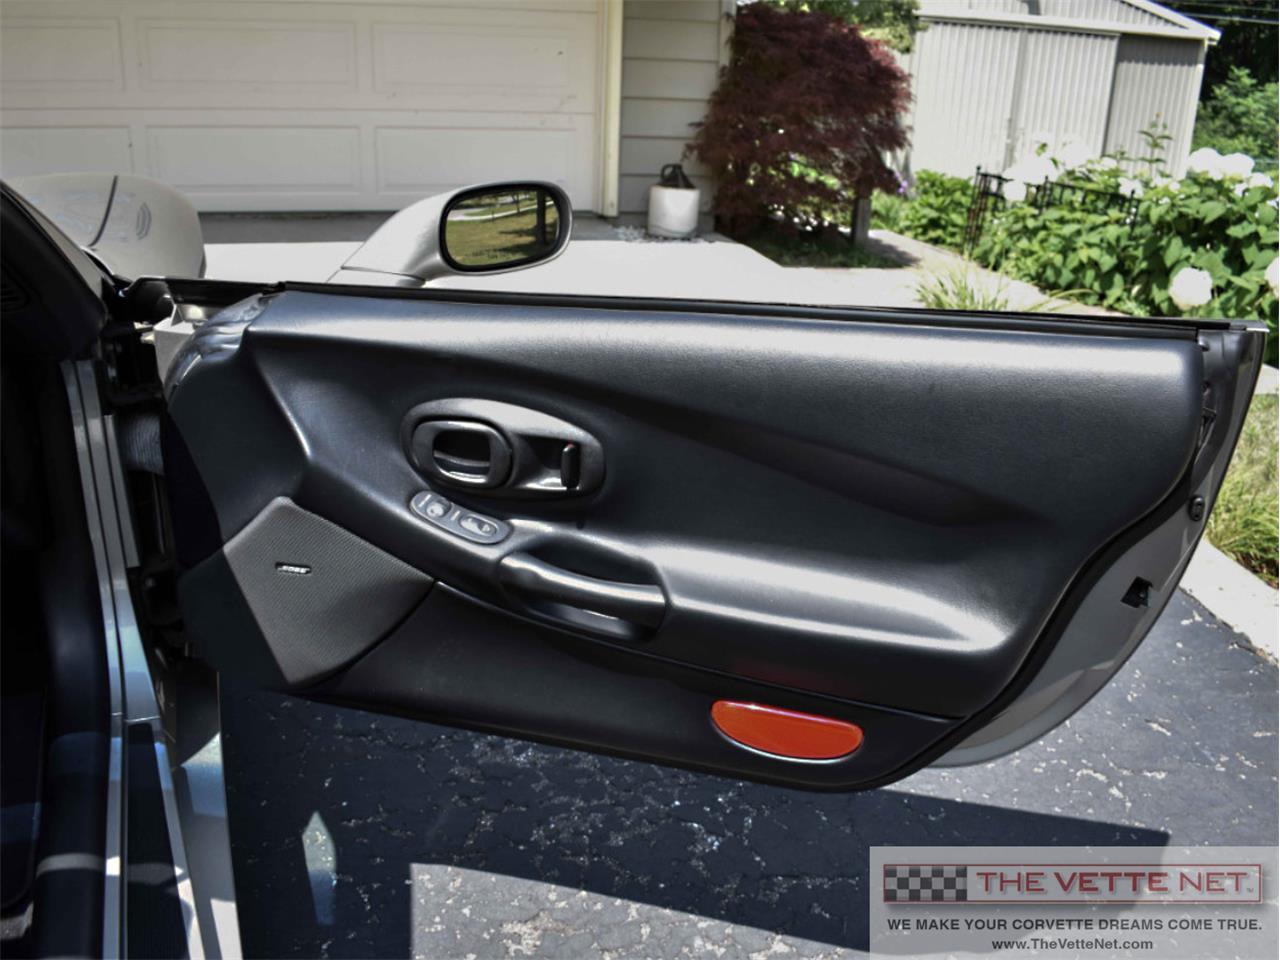 1999 Chevrolet Corvette (CC-1379234) for sale in Sarasota, Florida